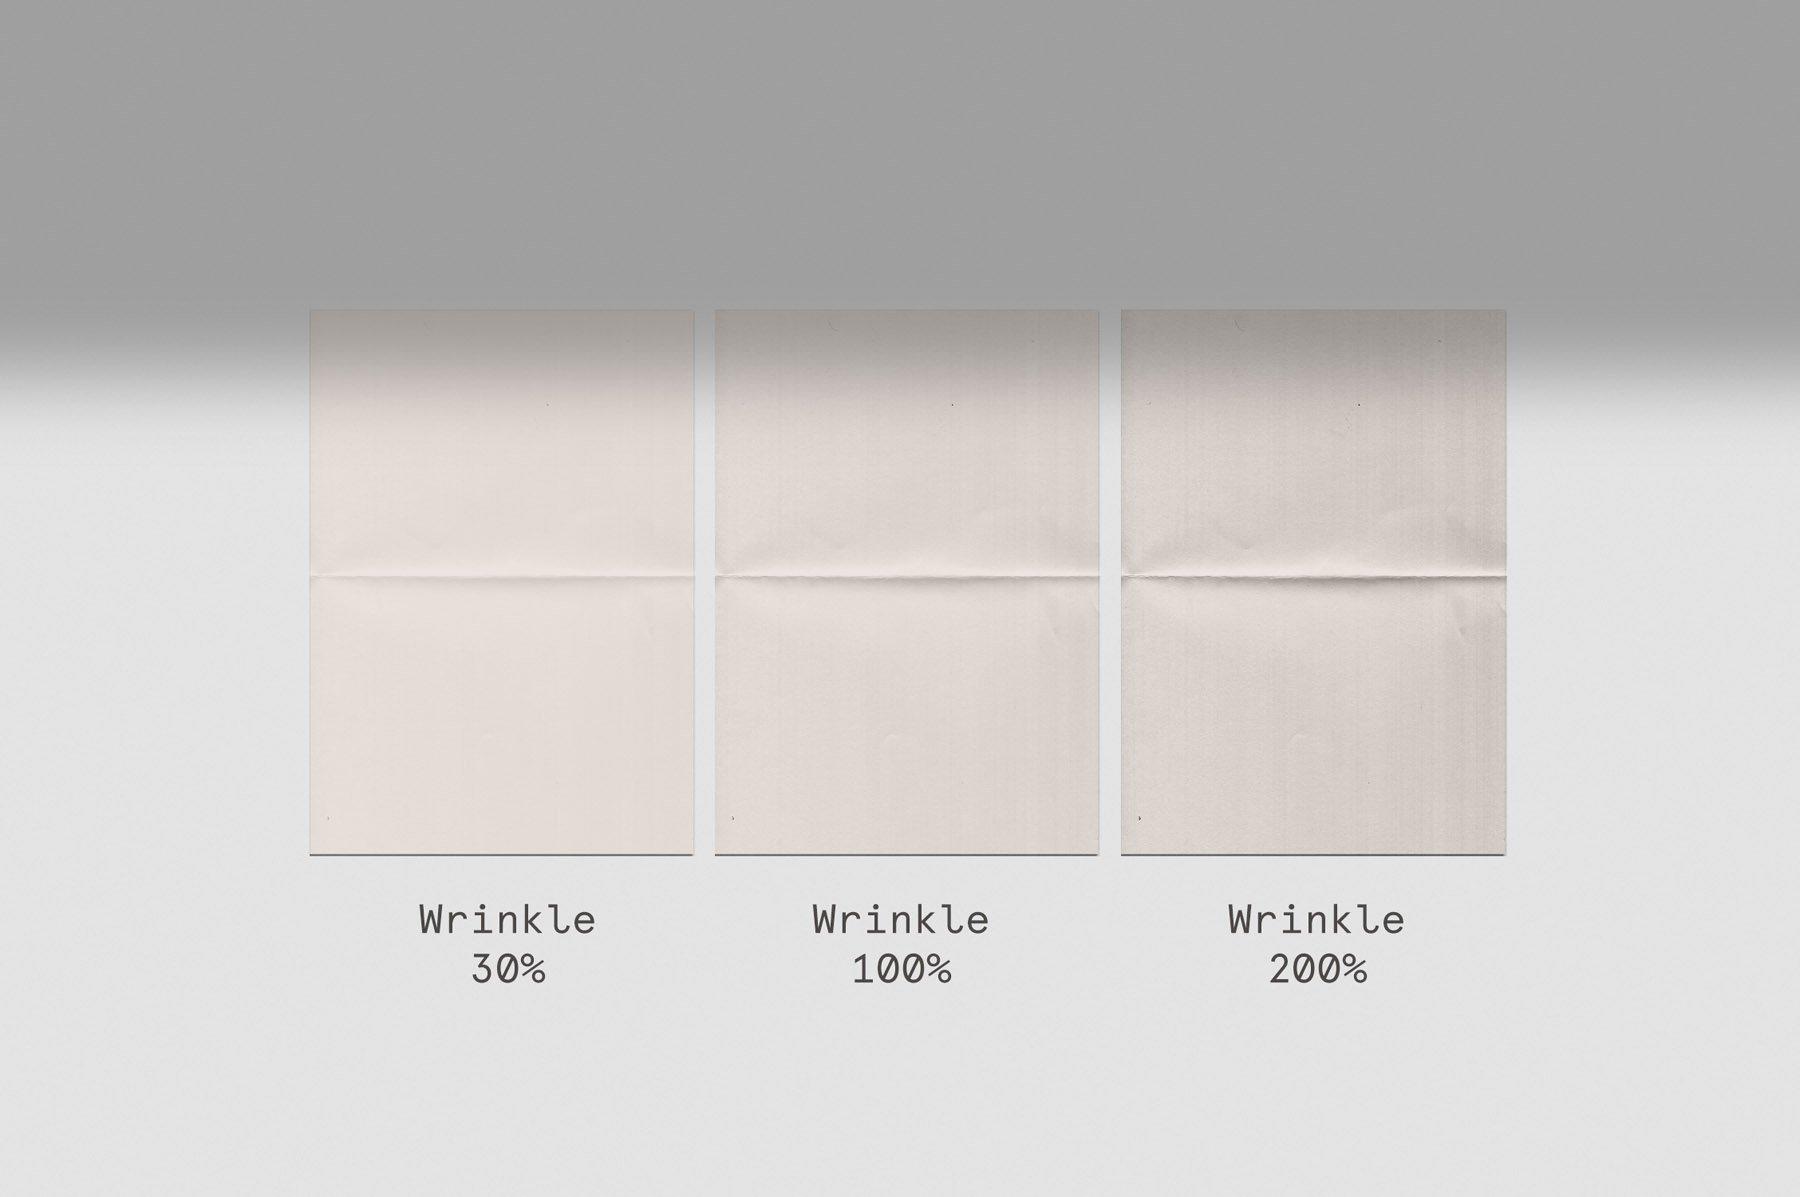 Bolderaja1 逼真自然皱纹折叠纸样机(4353)插图(5)